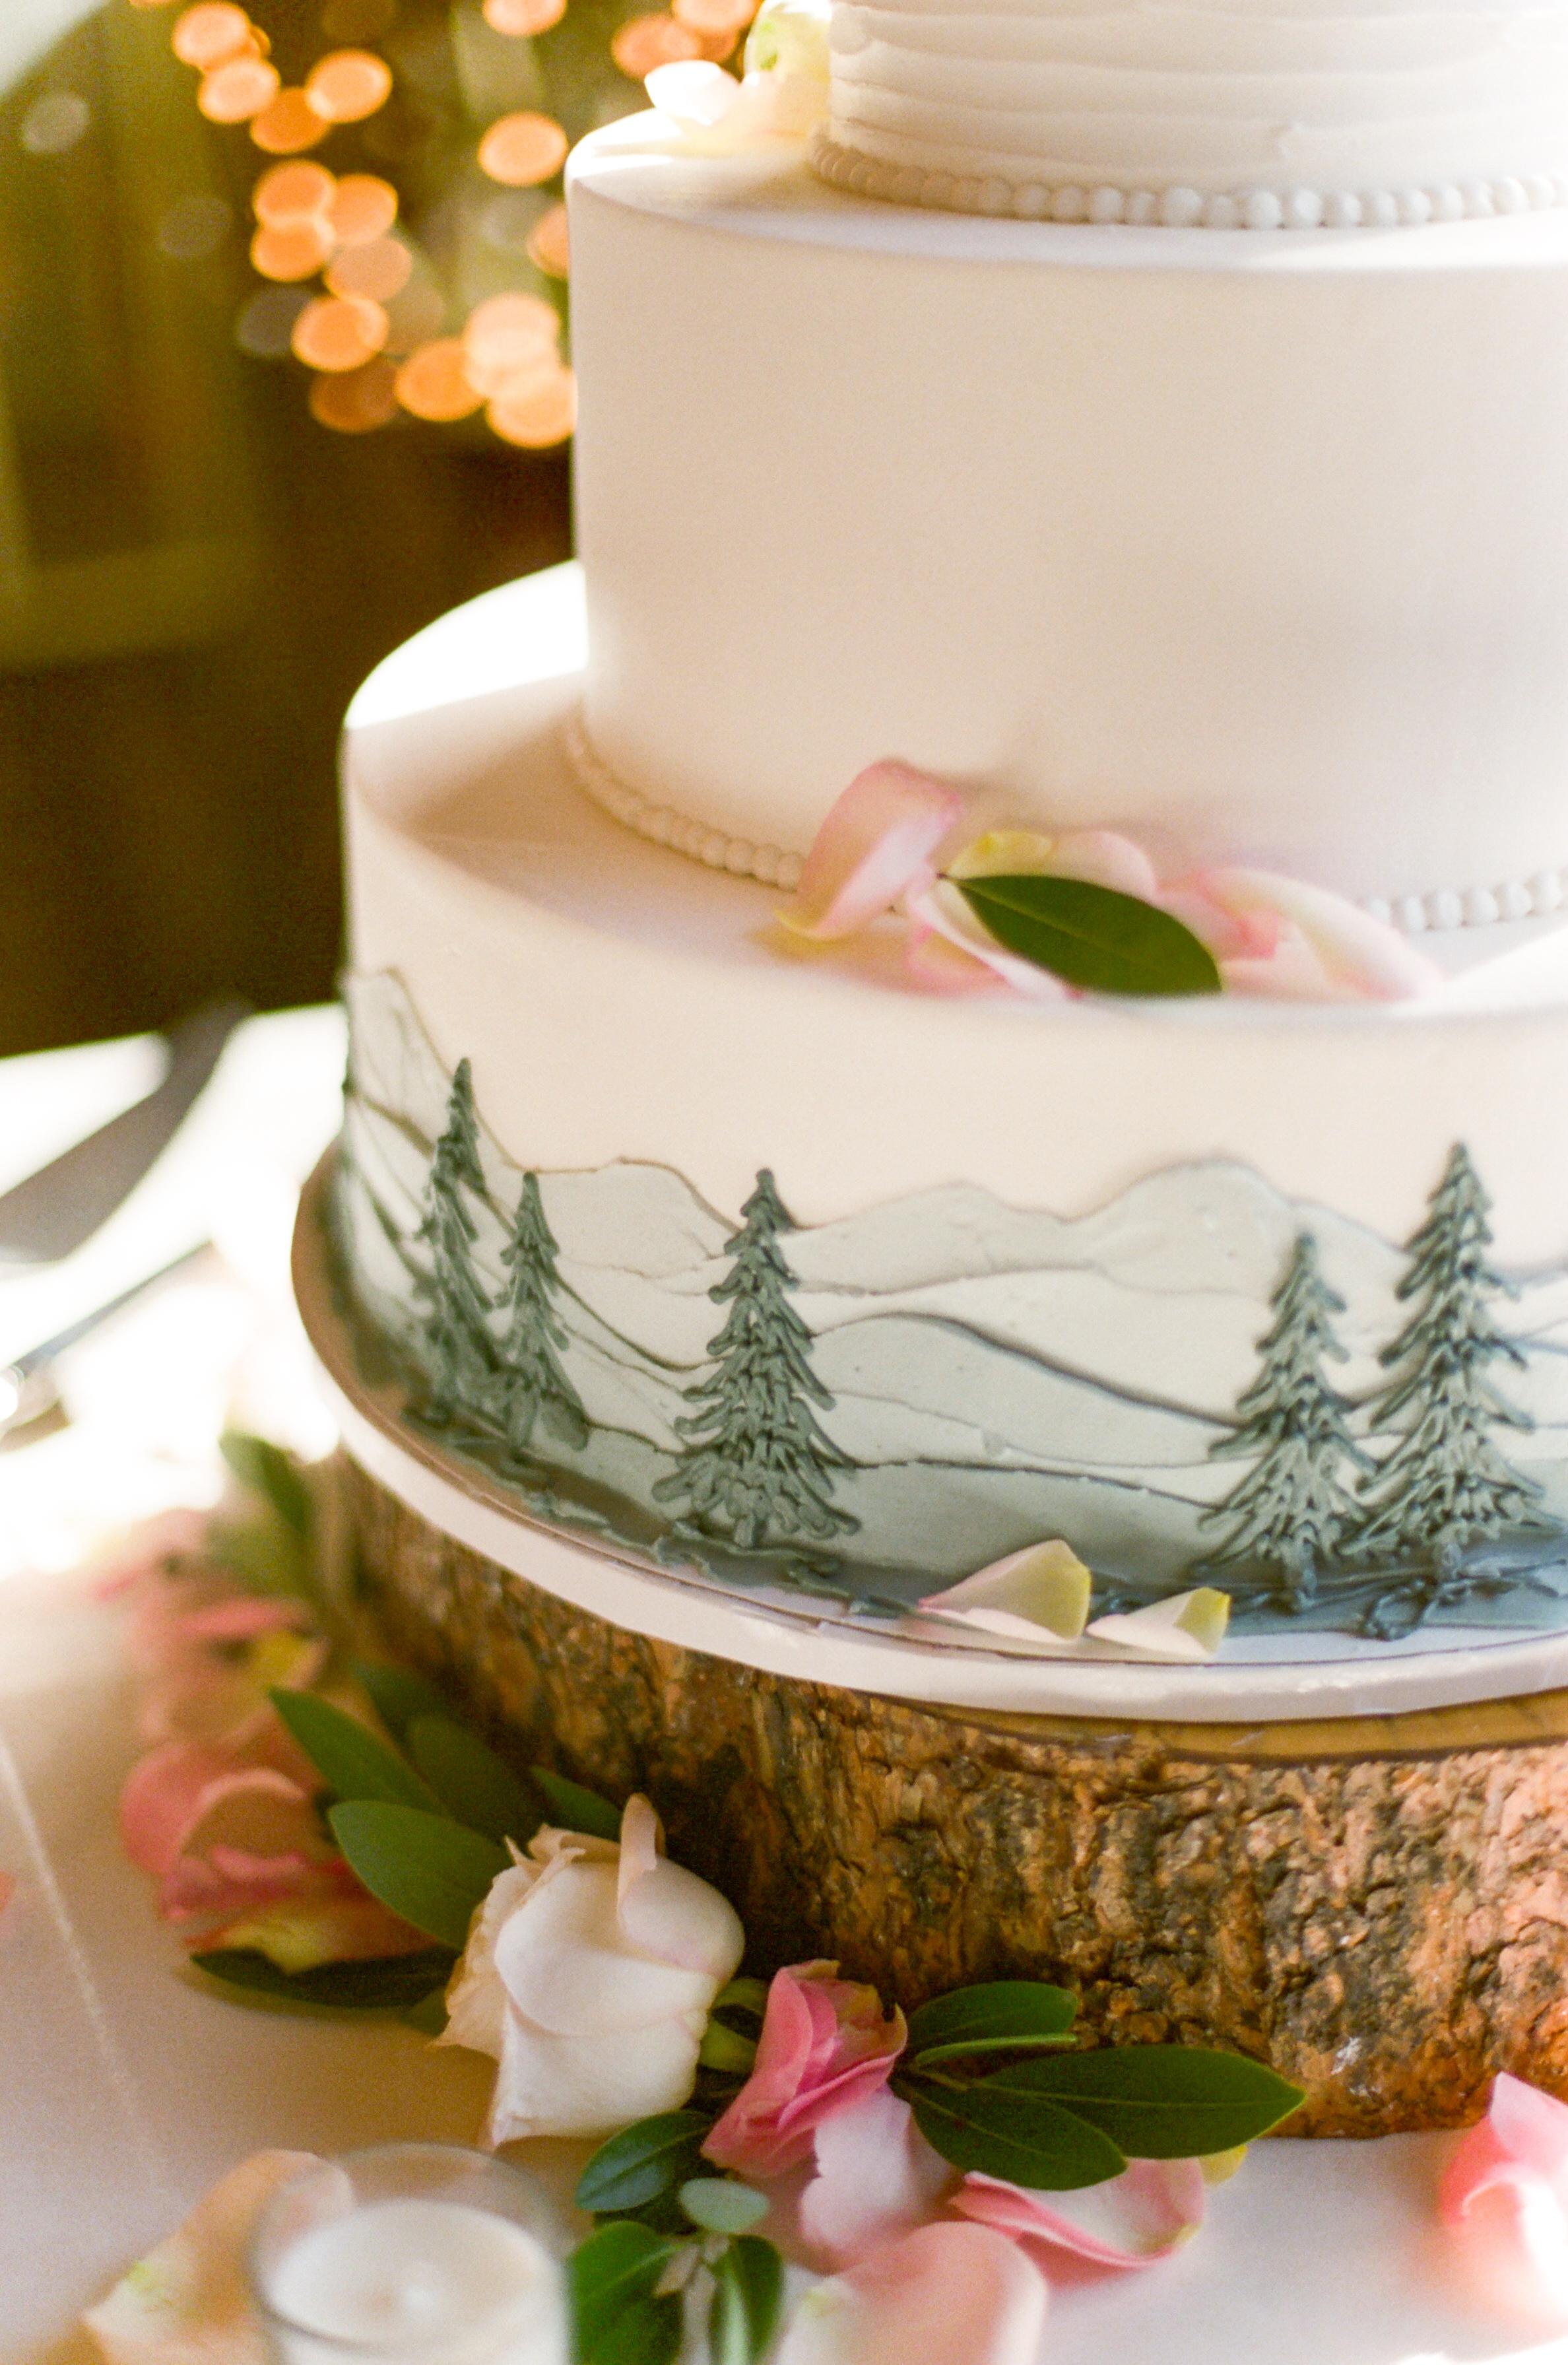 Twin_Owls_Steakhouse-wedding_photographer_Estes_Park_Lisa_ODwyer-491.jpg